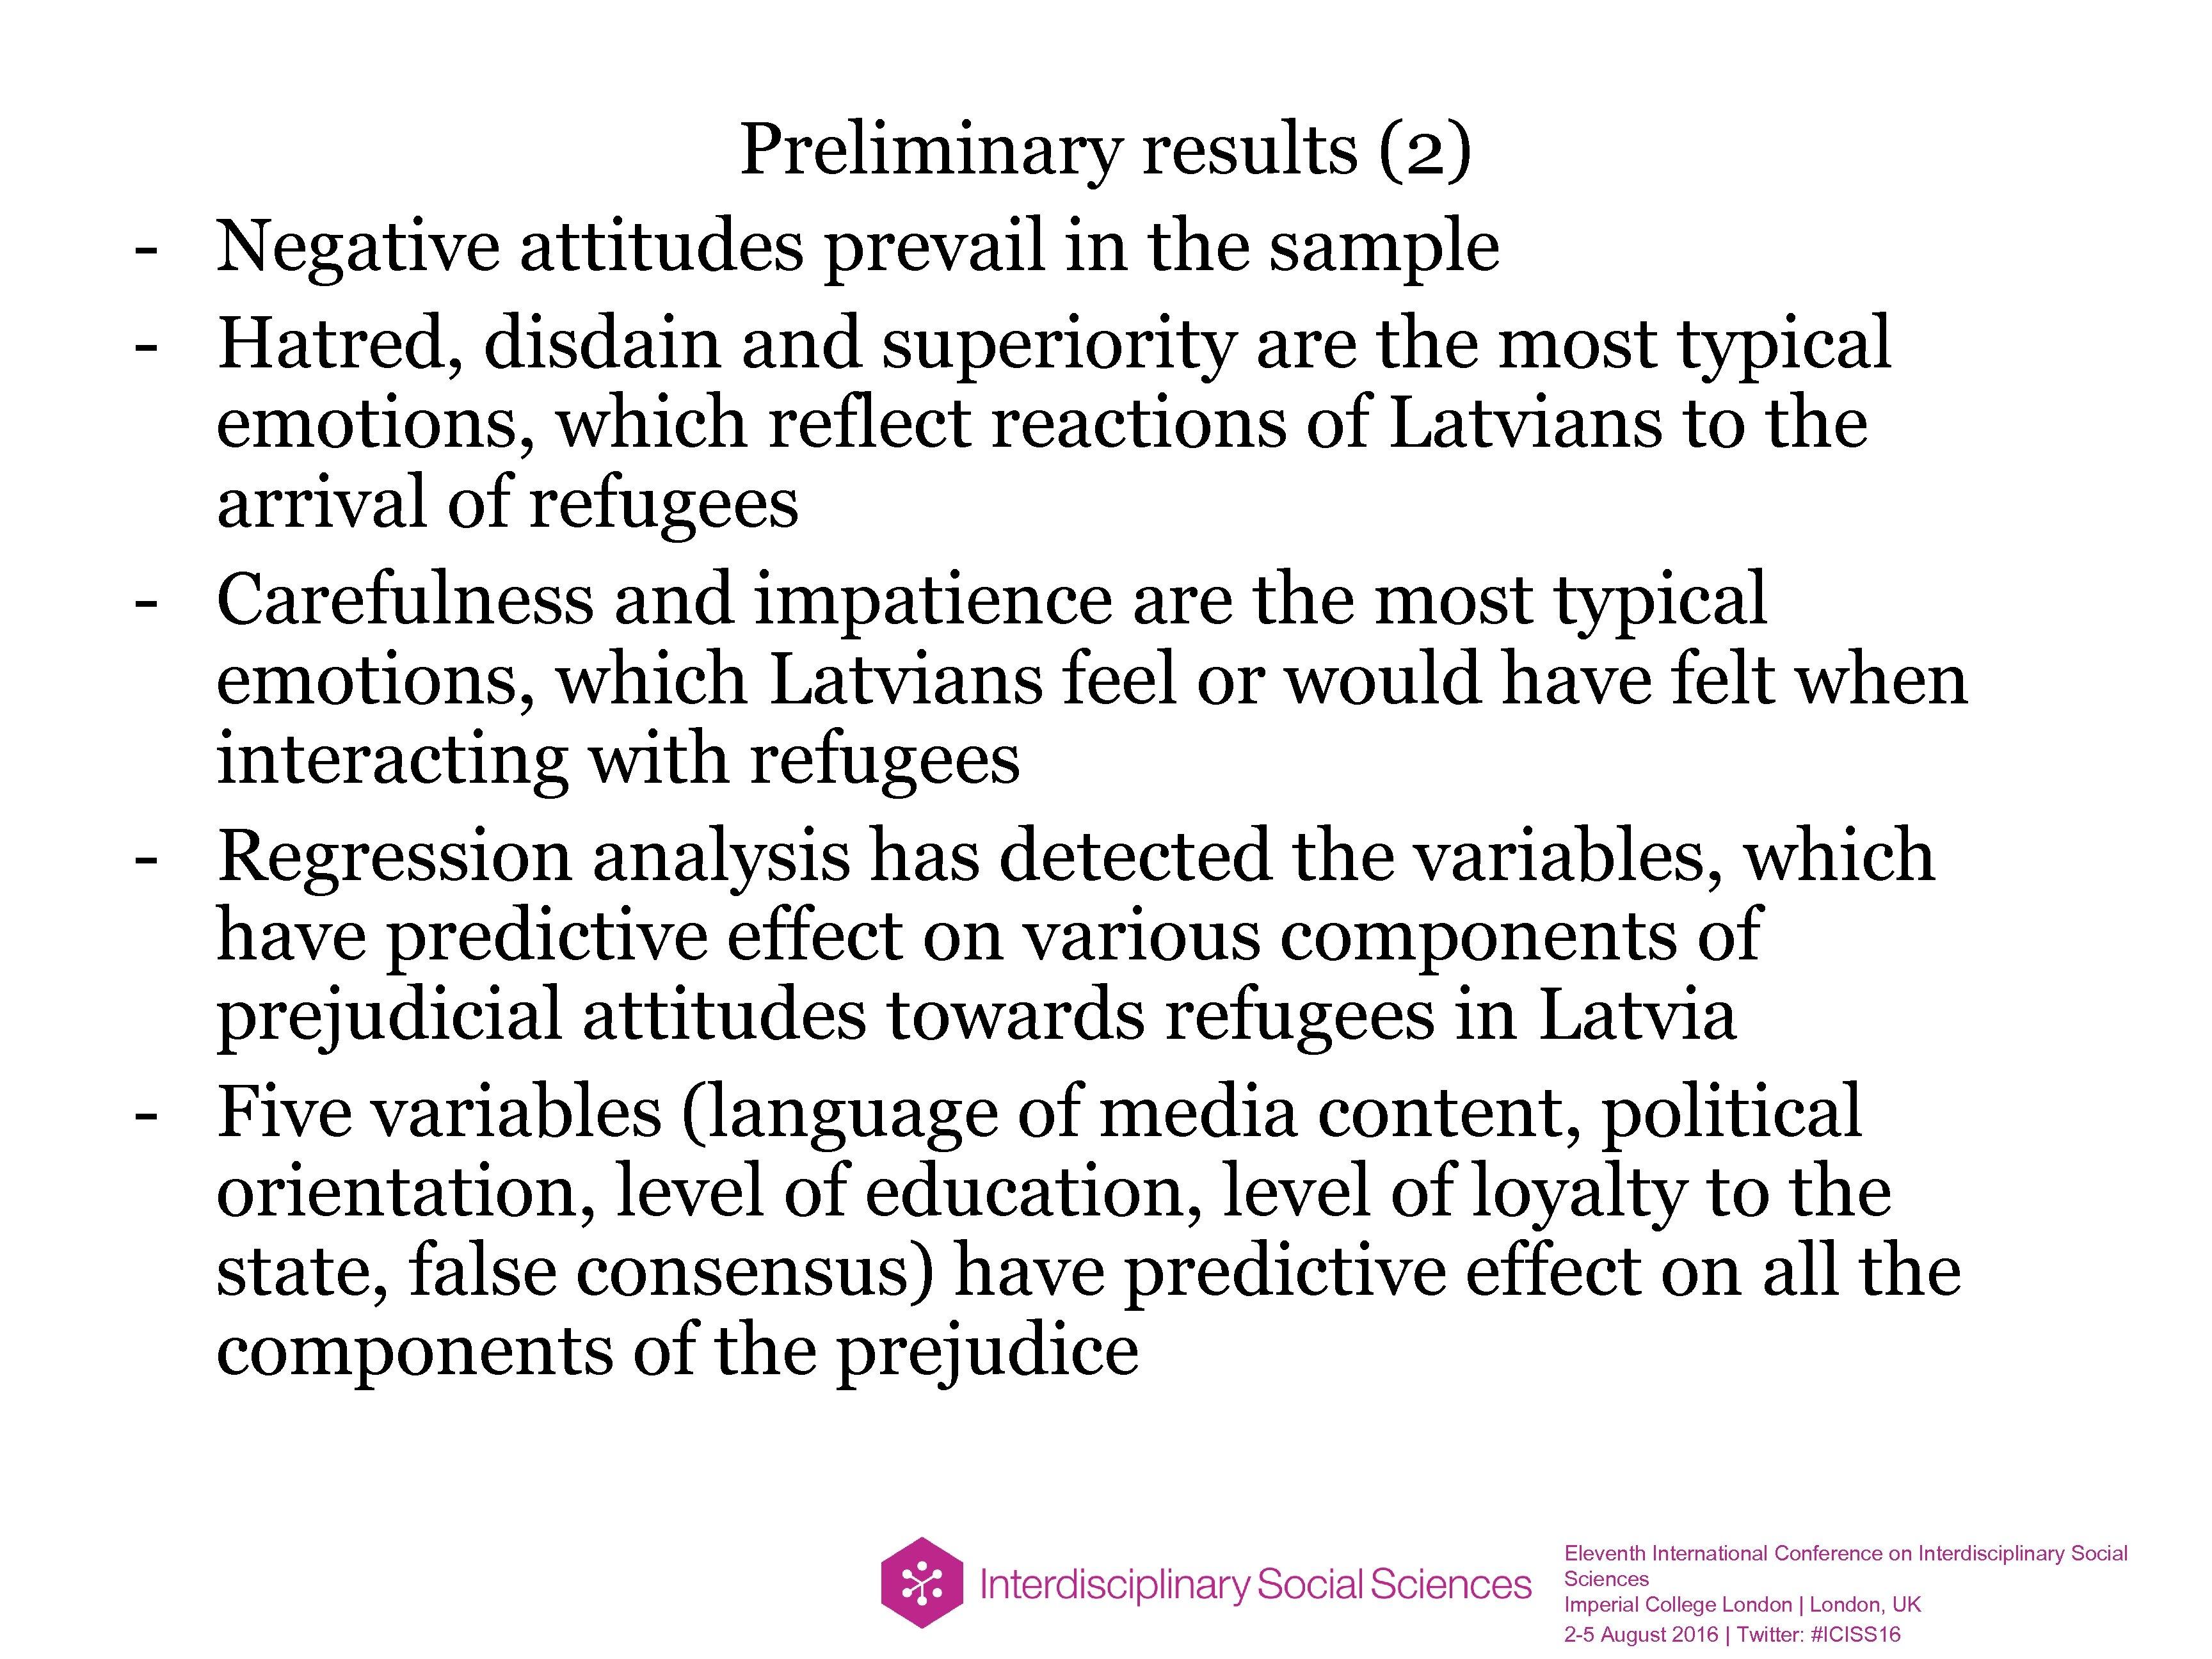 - Preliminary results (2) Negative attitudes prevail in the sample Hatred, disdain and superiority